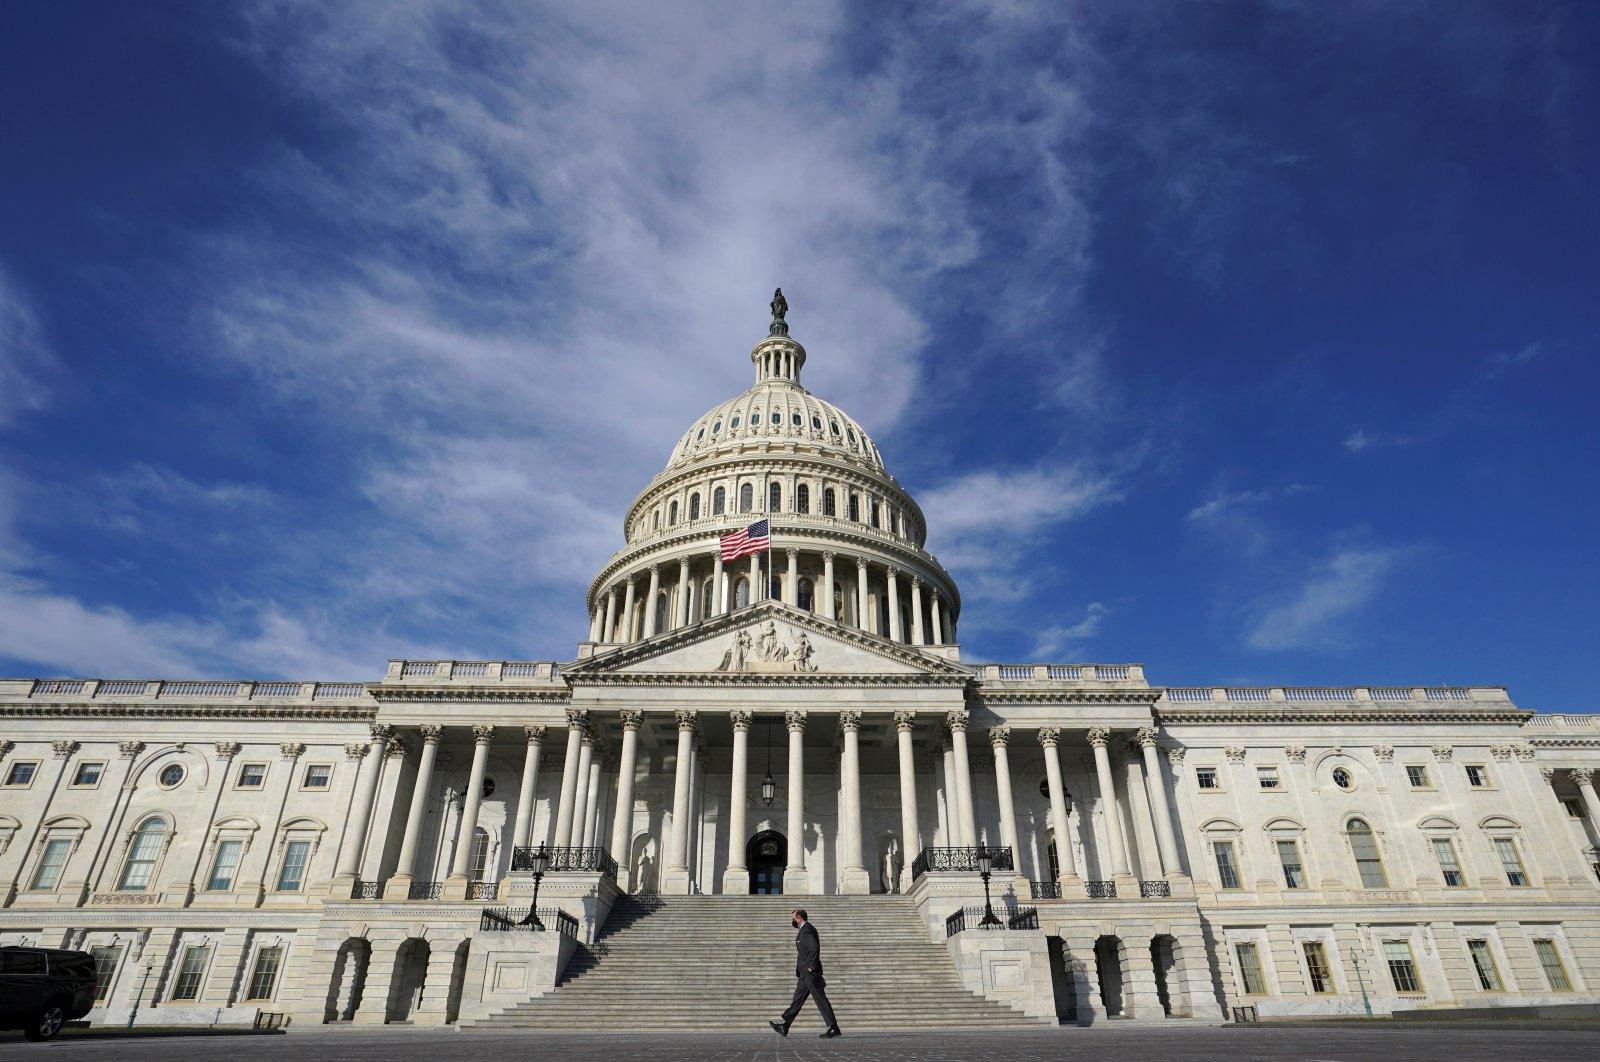 A man makes his way past the U.S. Capitol in Washington, U.S., Feb. 26, 2021. (Reuters Photo)